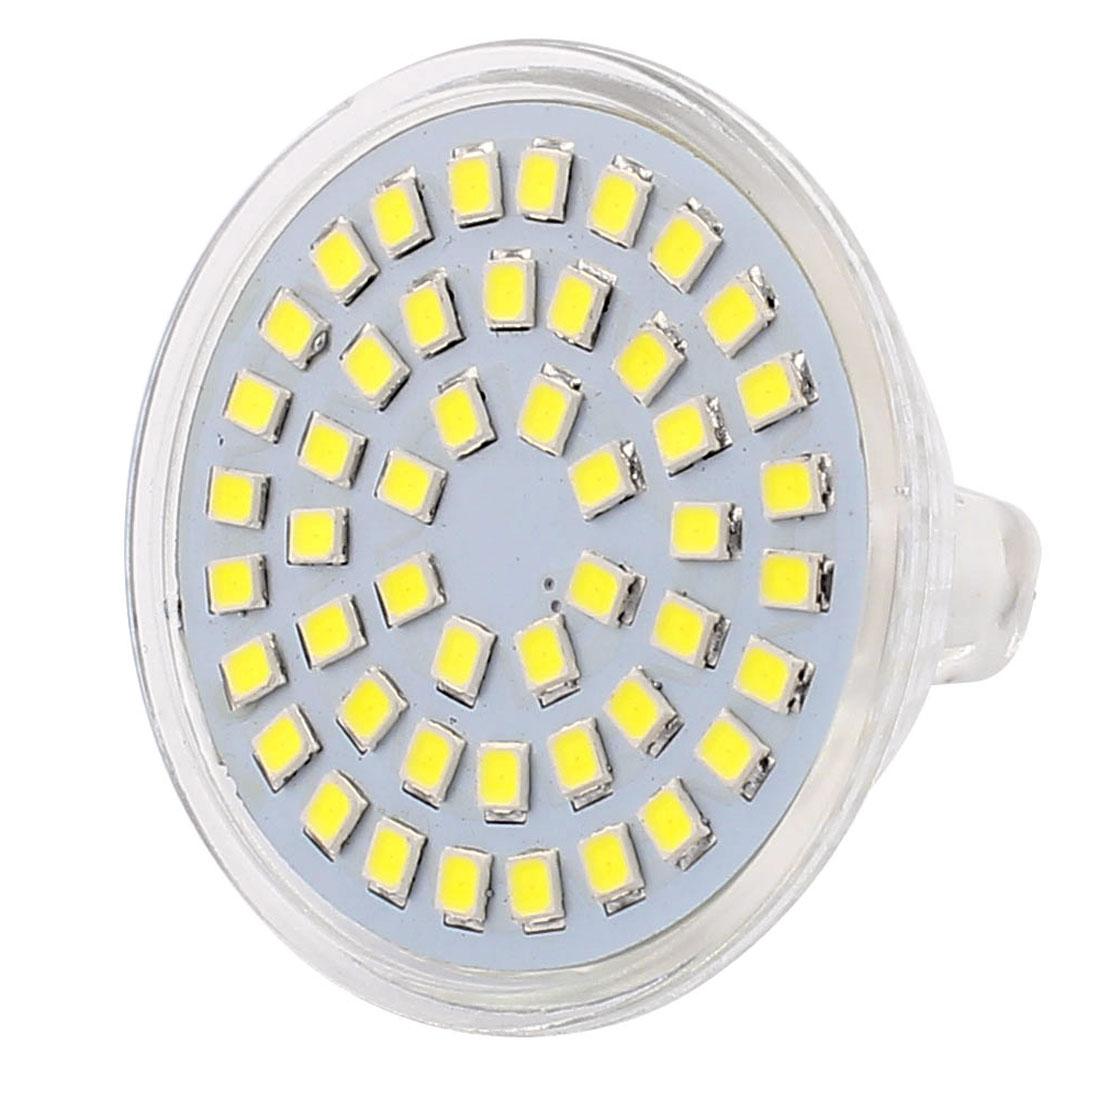 MR16 SMD 2835 48 LEDs Glass Energy-Saving LED Lamp Bulb White AC 110V 4W